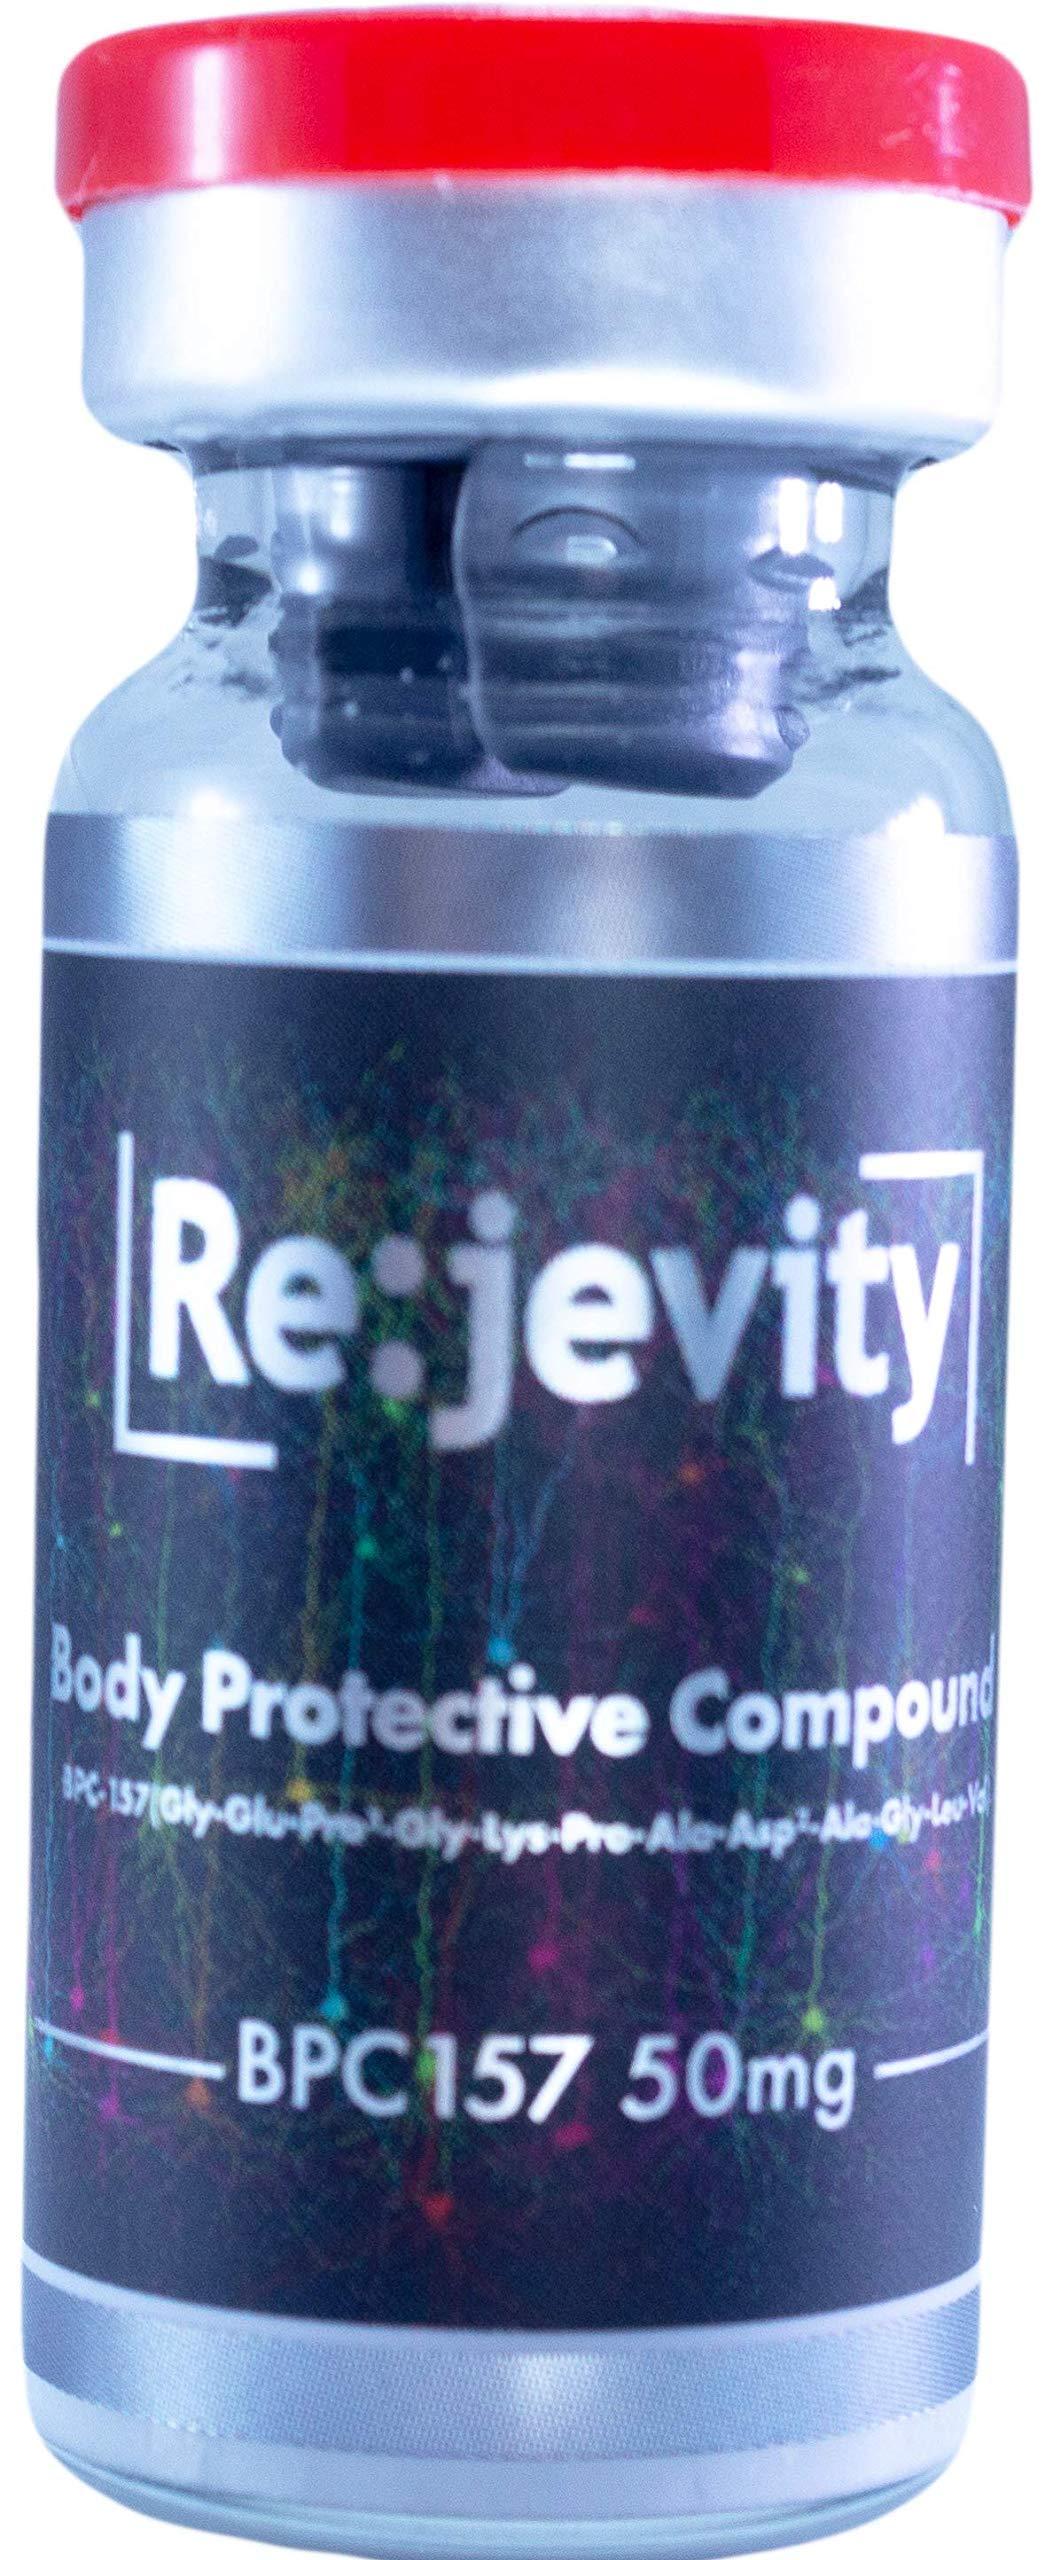 Rejevity BPC-157 50mg (Body Protective Compound) by GroupGanix